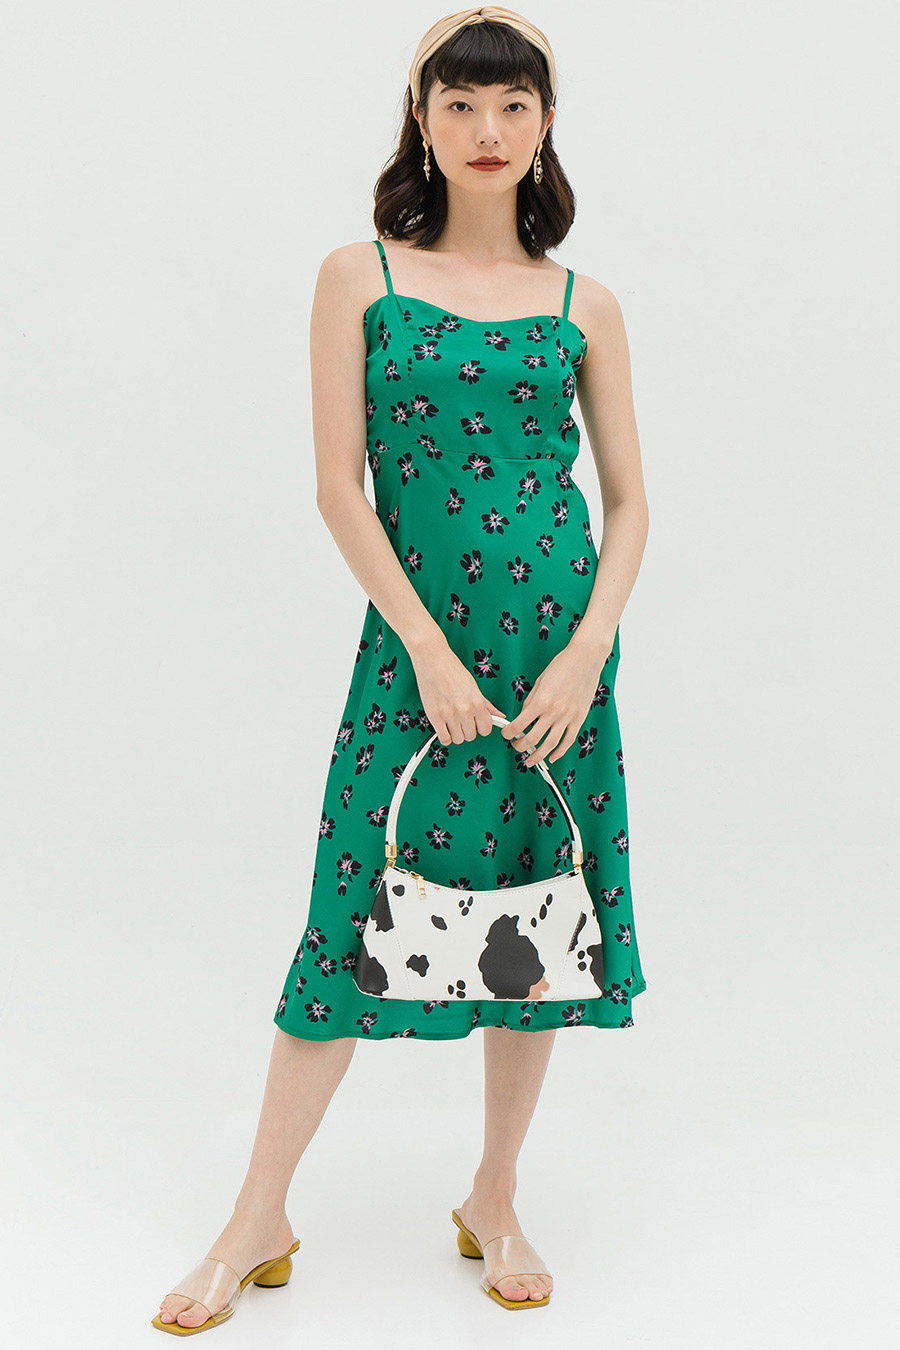 ANNETTE DRESS - JADE FLEUR